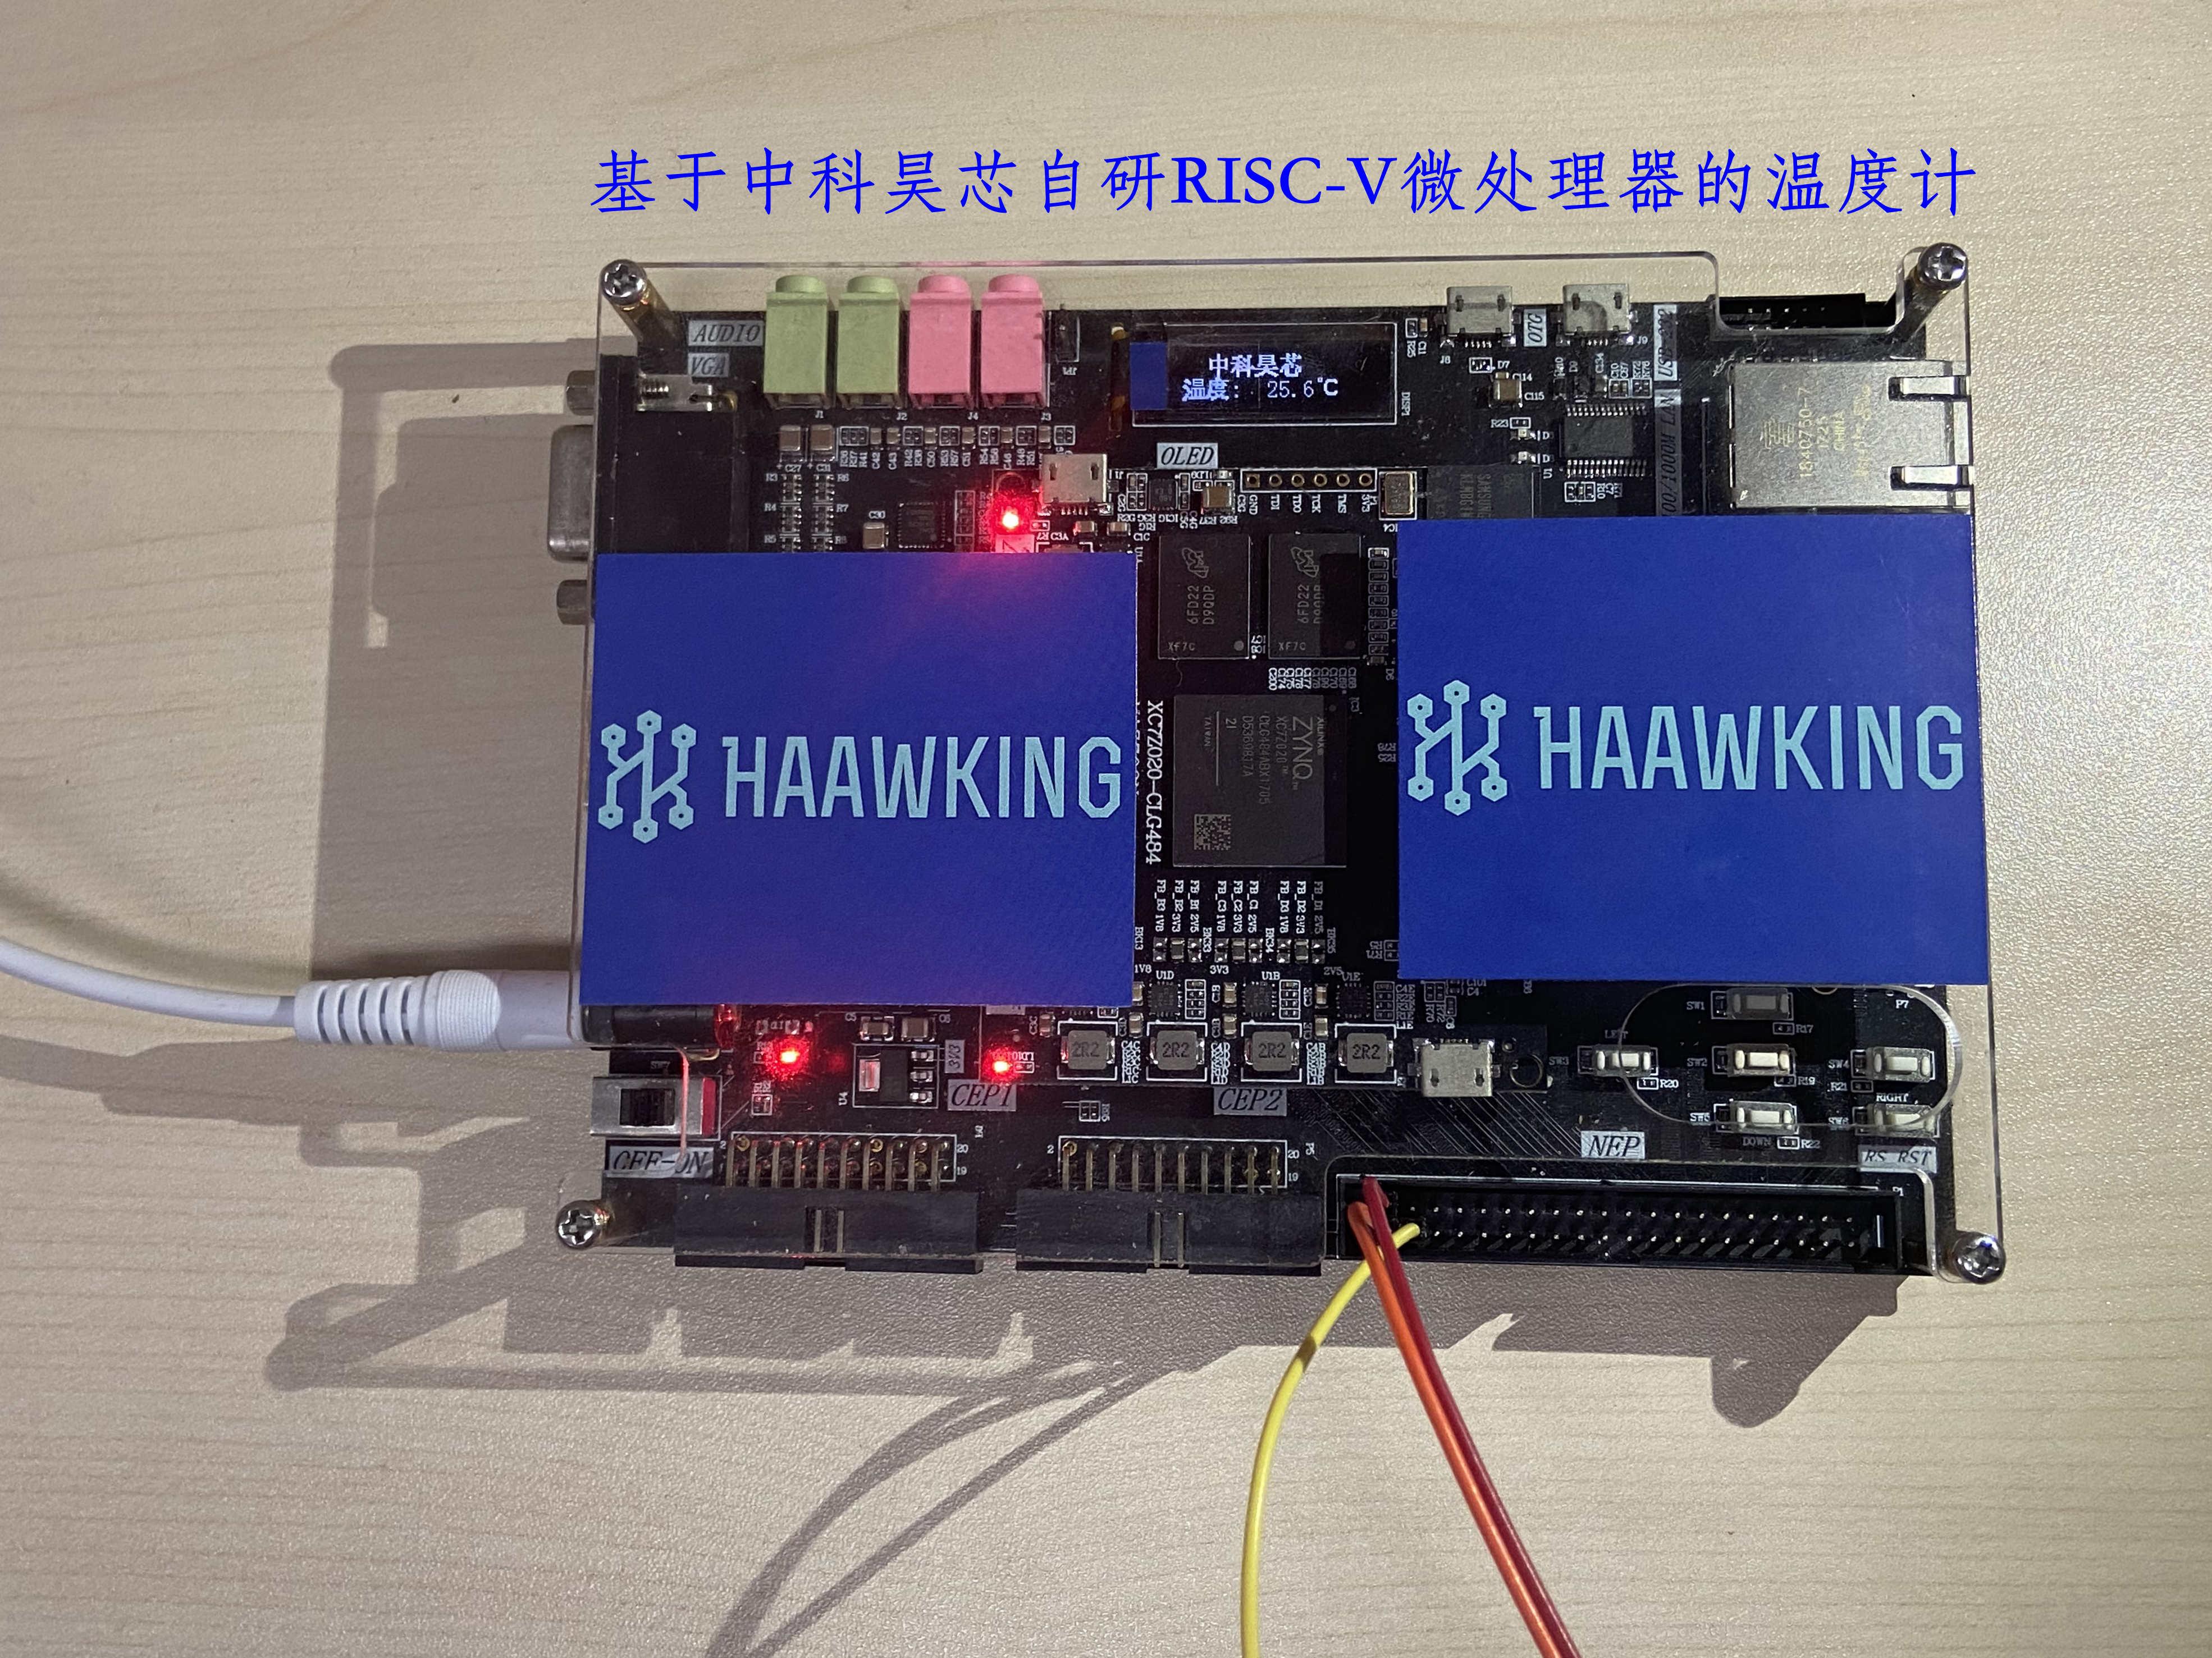 haawking-riscv-demo-temp-sensor